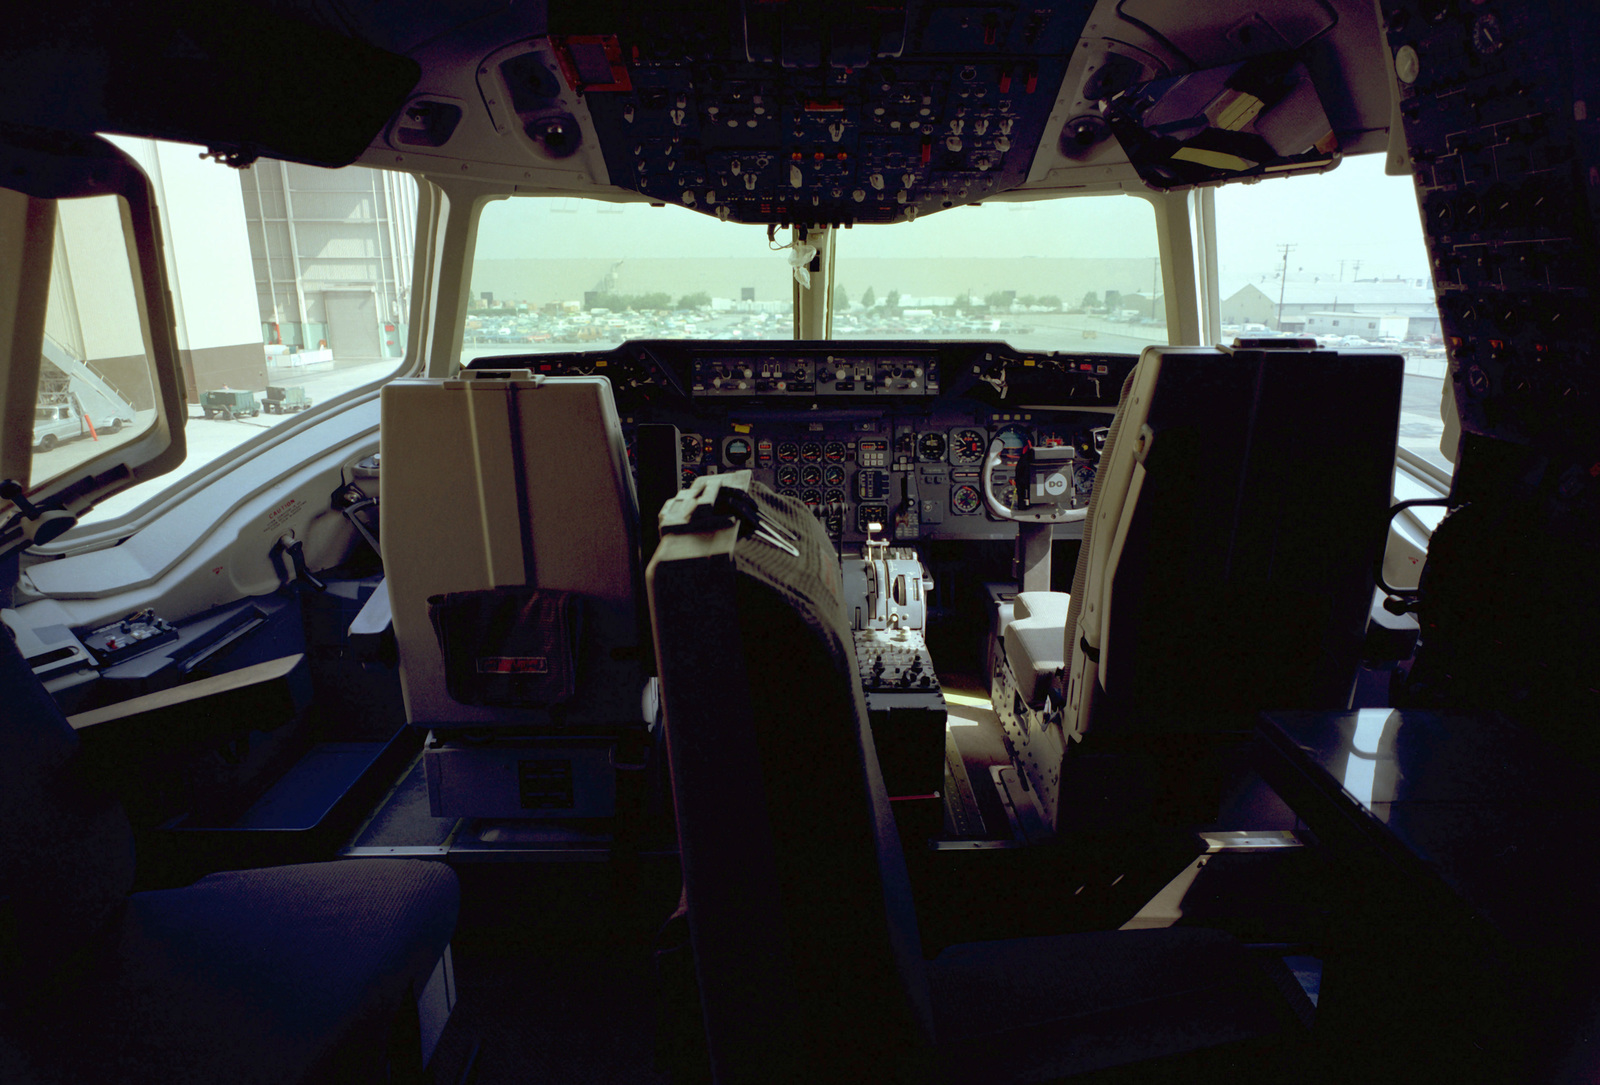 AN interior view of the cockpit of a KC-10A Extender aircraft